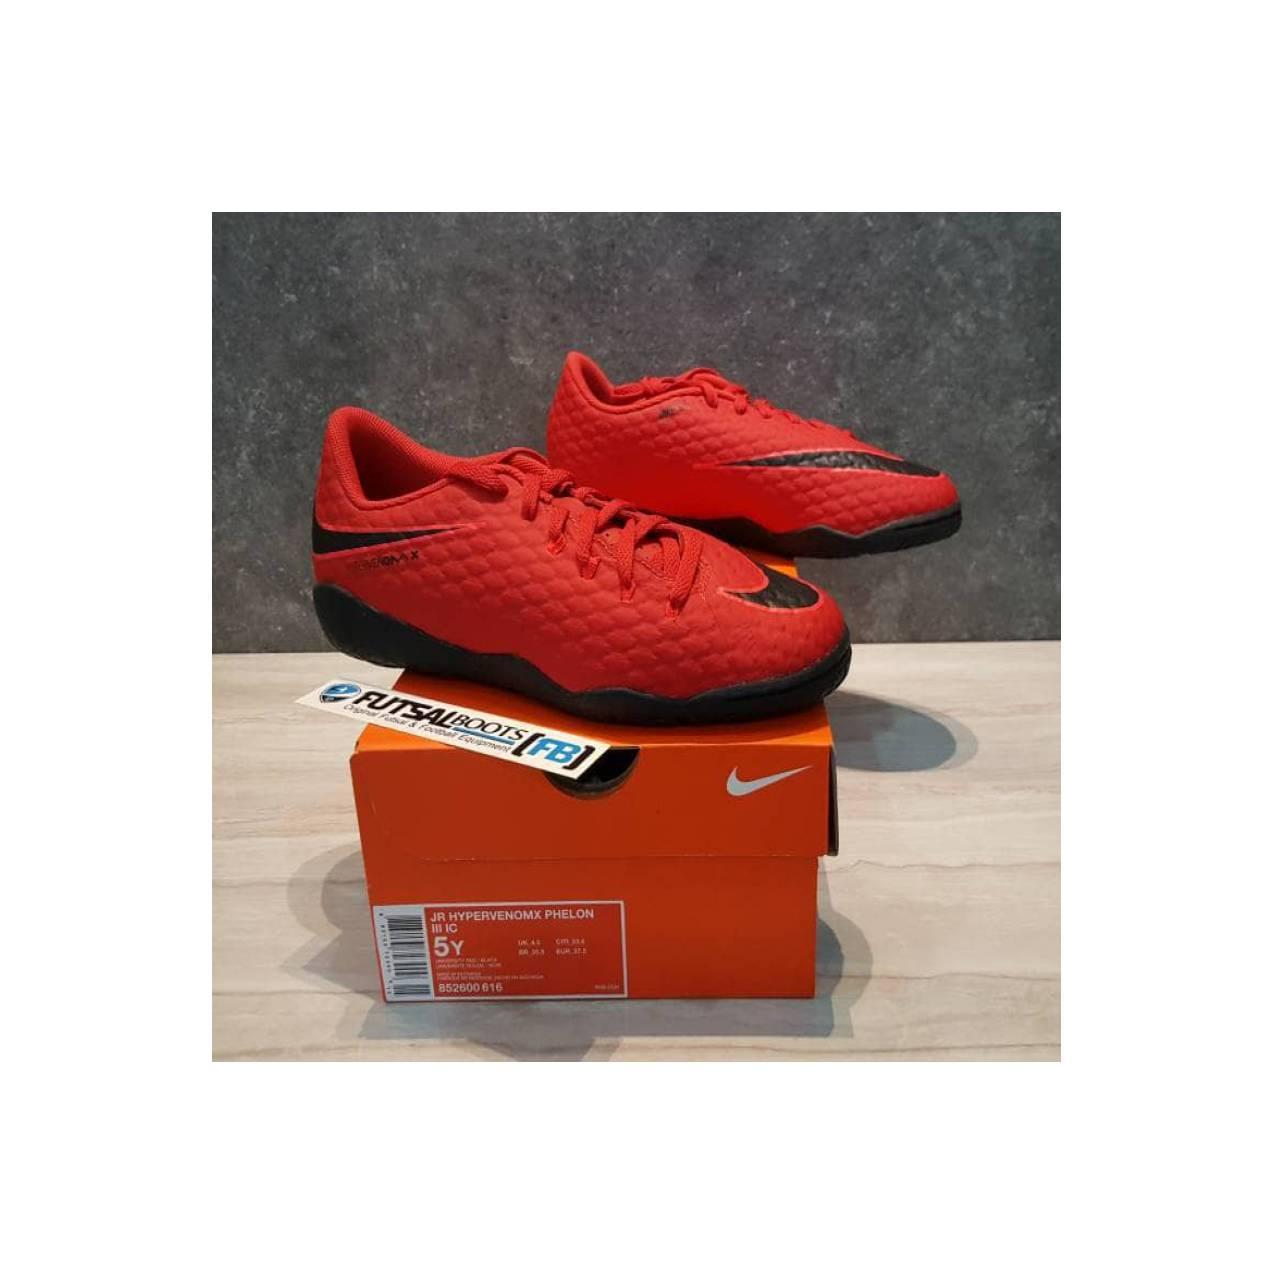 Sepatu Futsal Anak Nike Kids Hypervenom X Phelon IC JR - Red